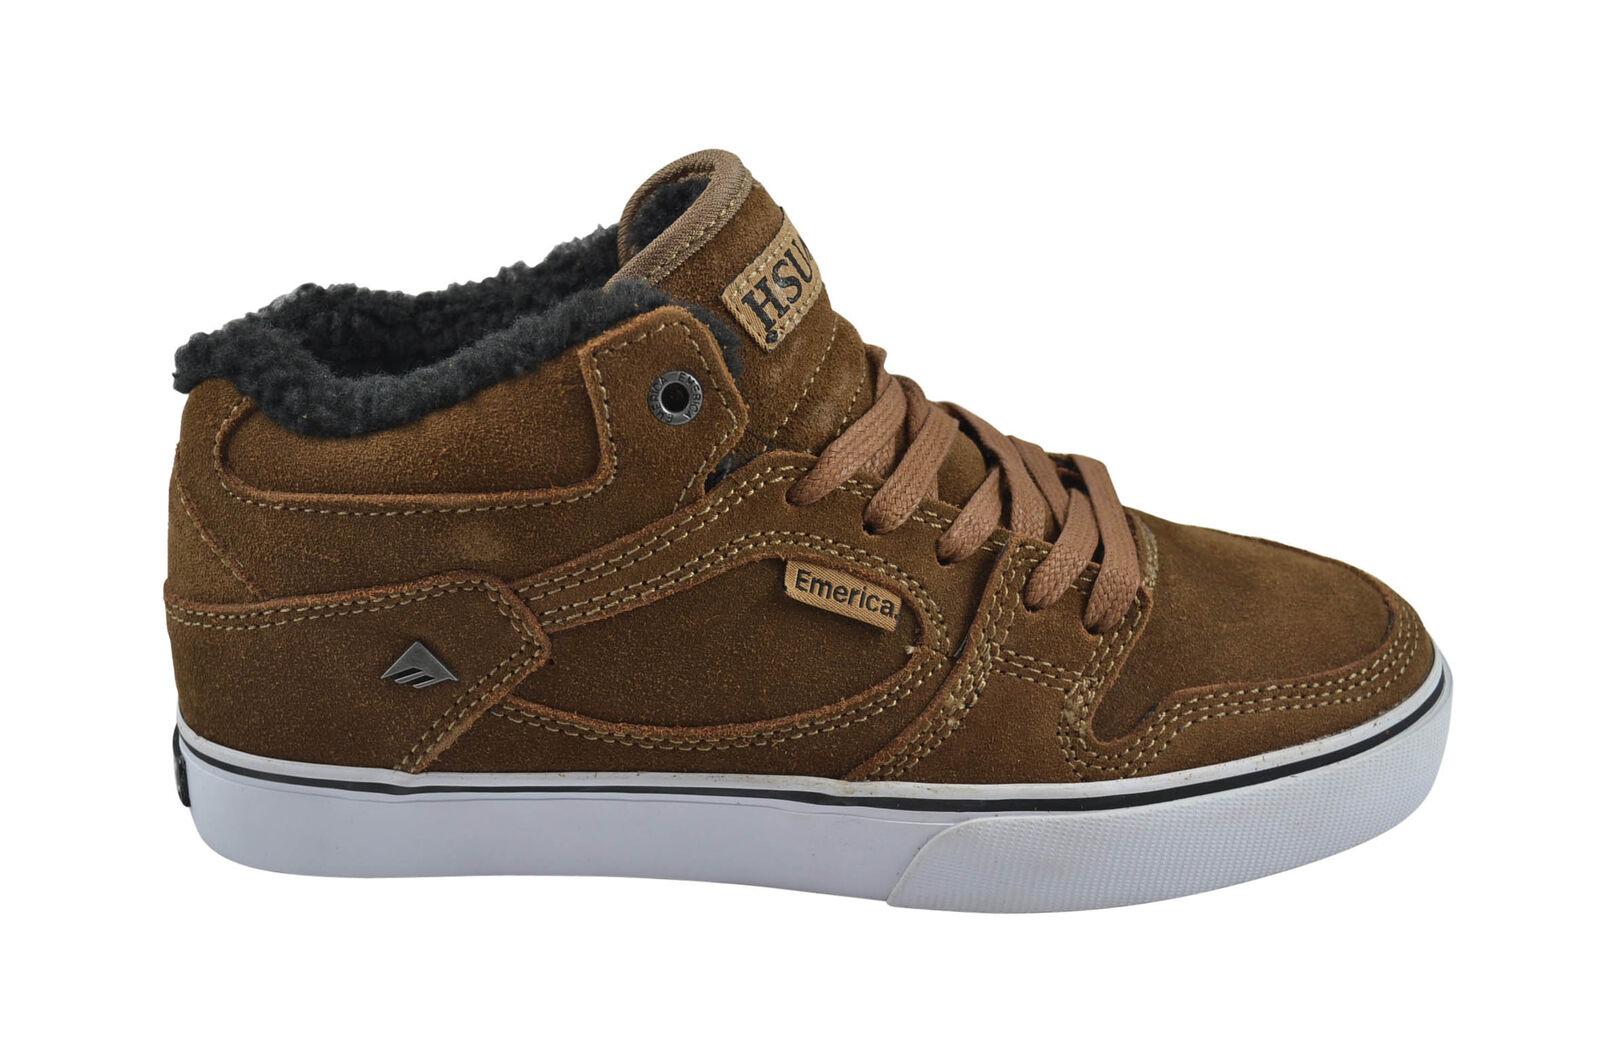 Emerica HSU SMU Skater Schuhe/Sneaker brown/white/brown Größenauswahl!!